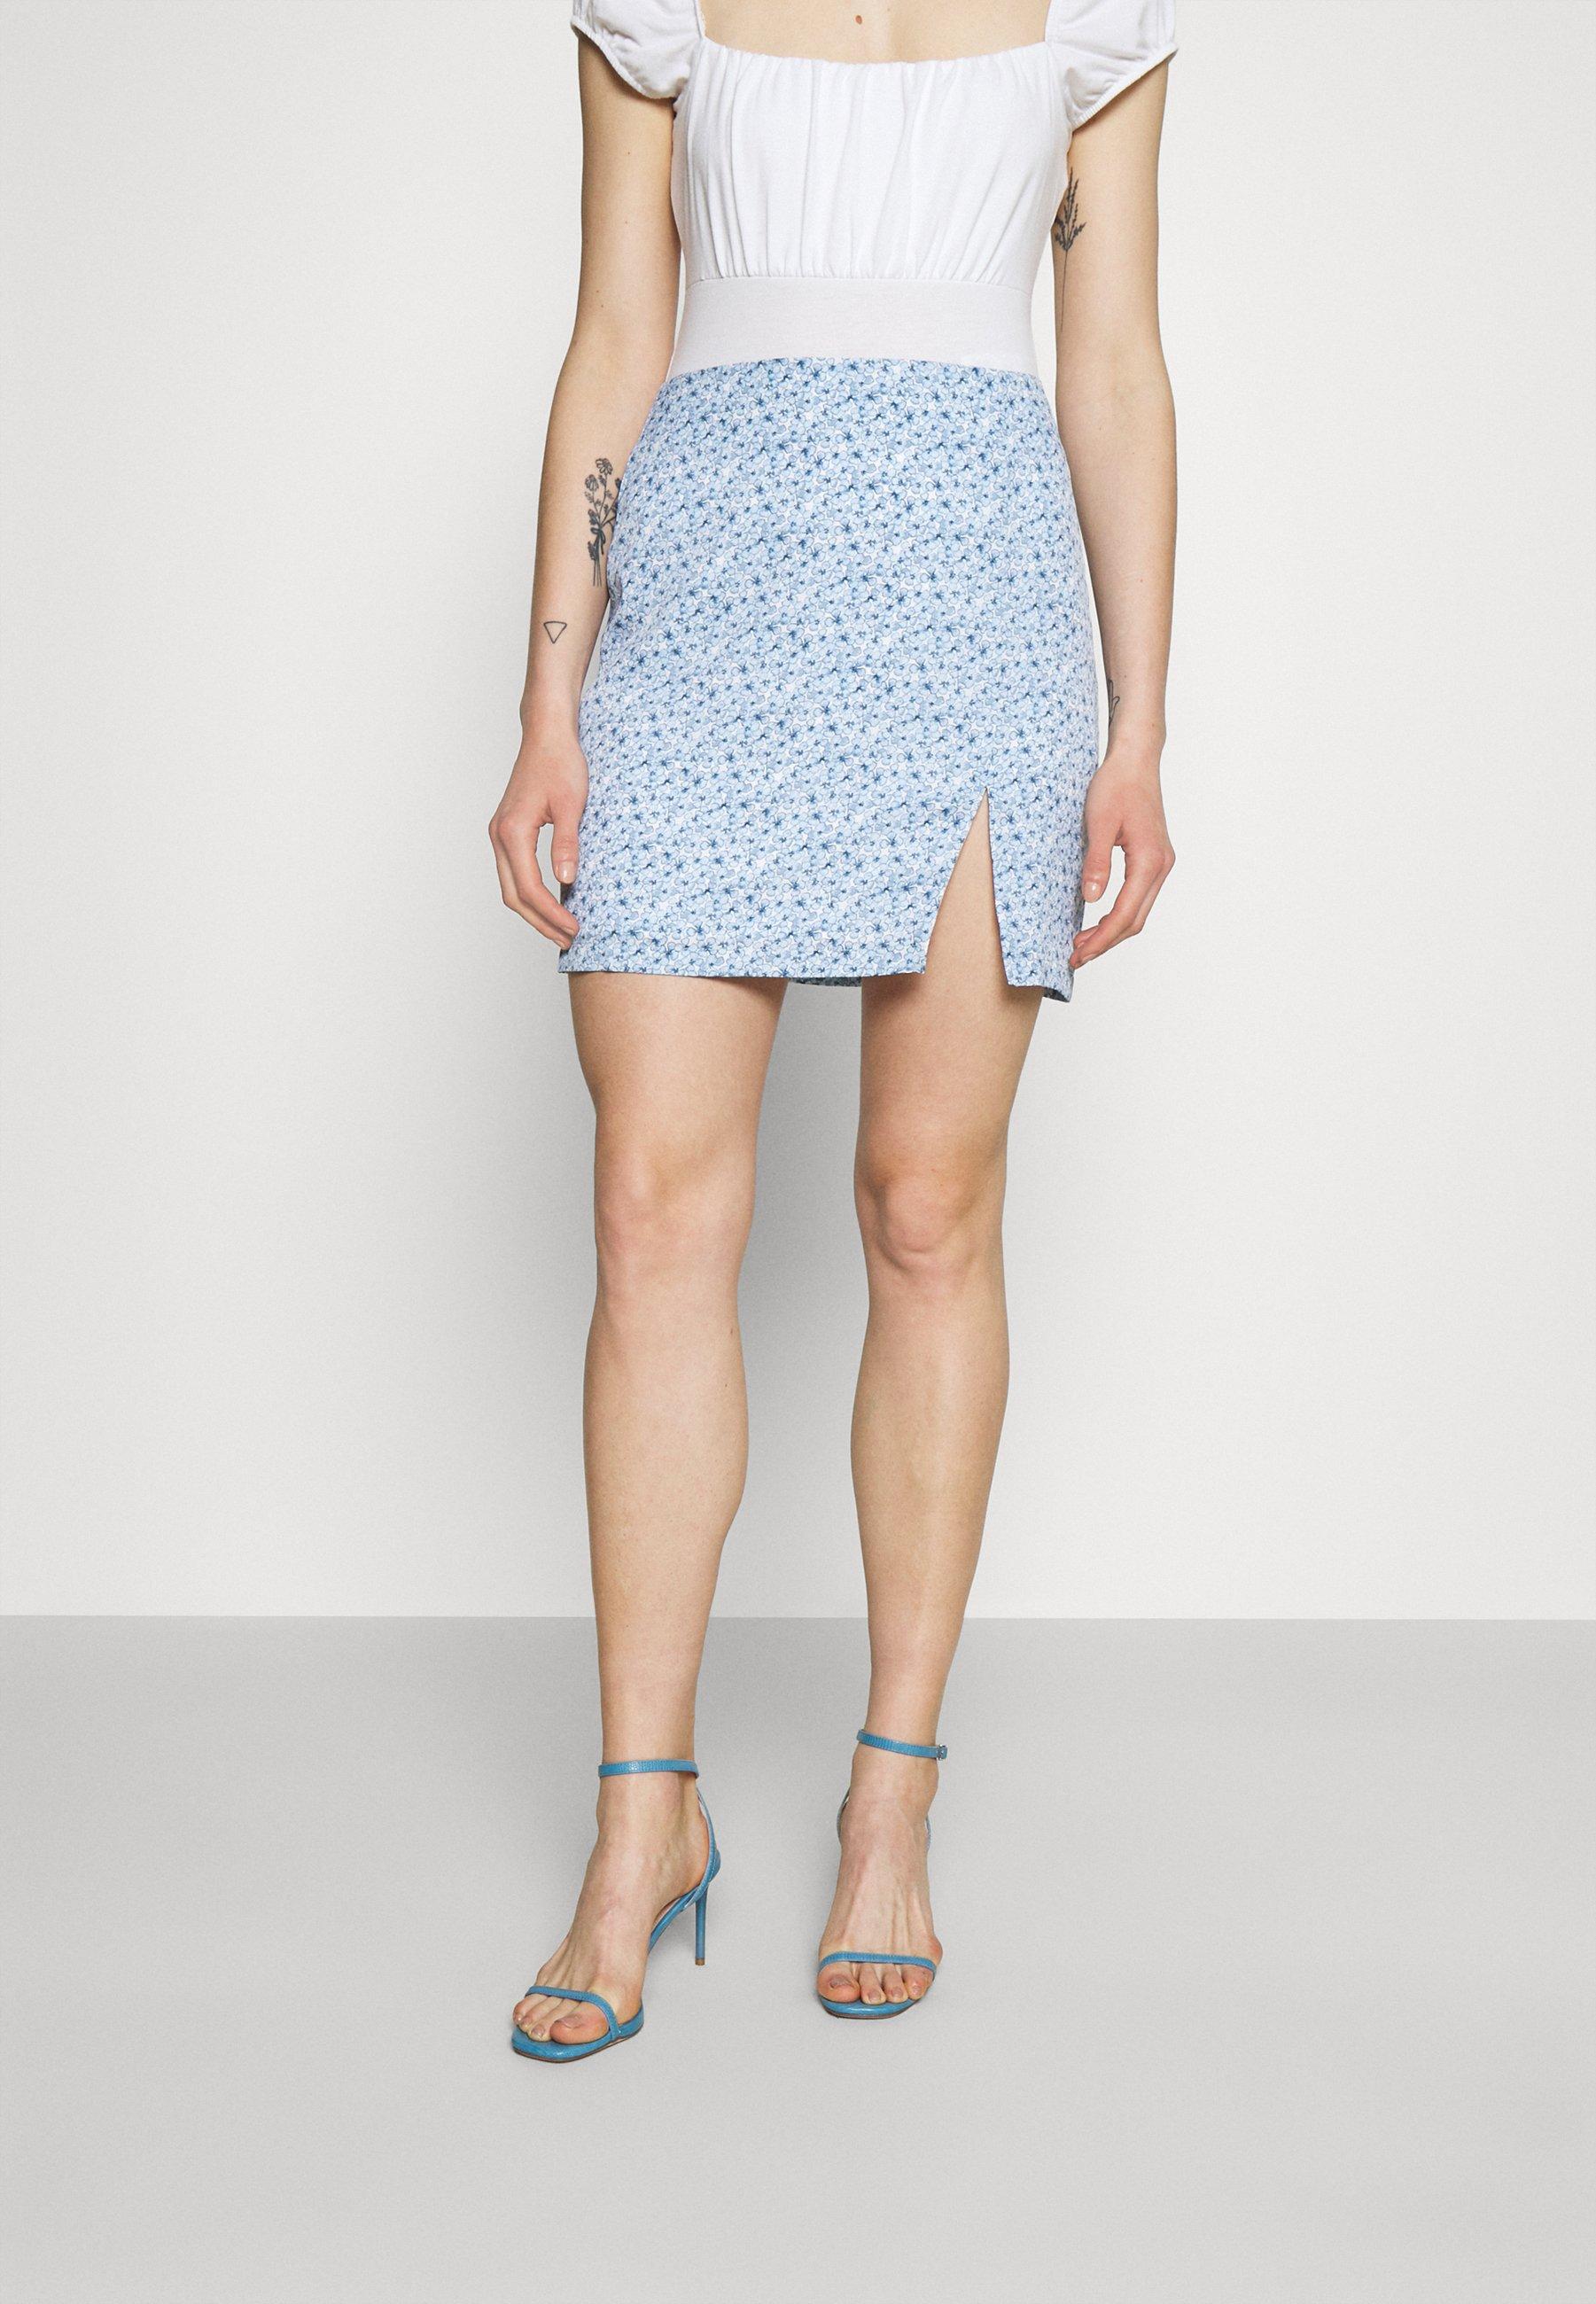 Femme PAMELA REIF X ZALANDO FRONT SLIT RECYCLED MINI SKIRT - Minijupe